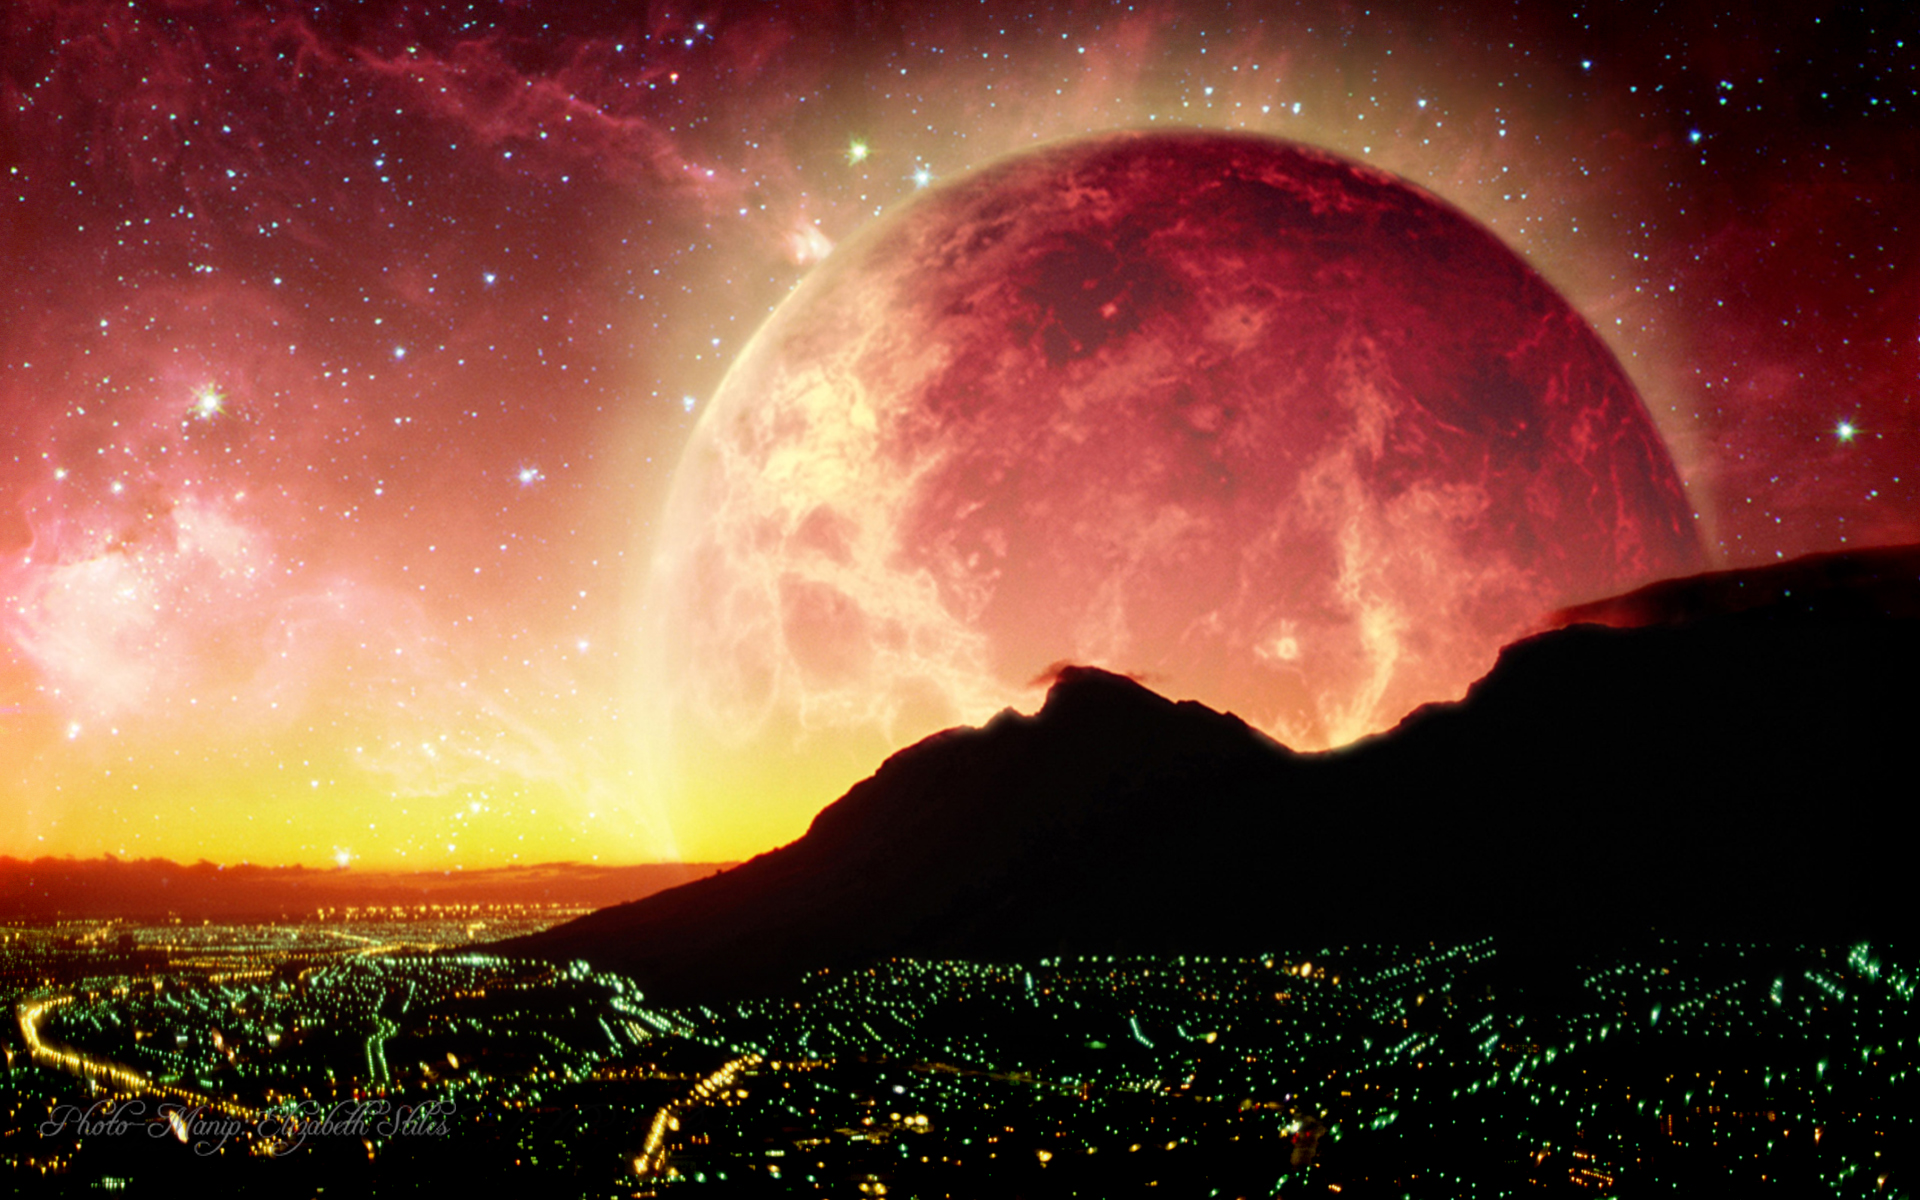 city night sky background - photo #28